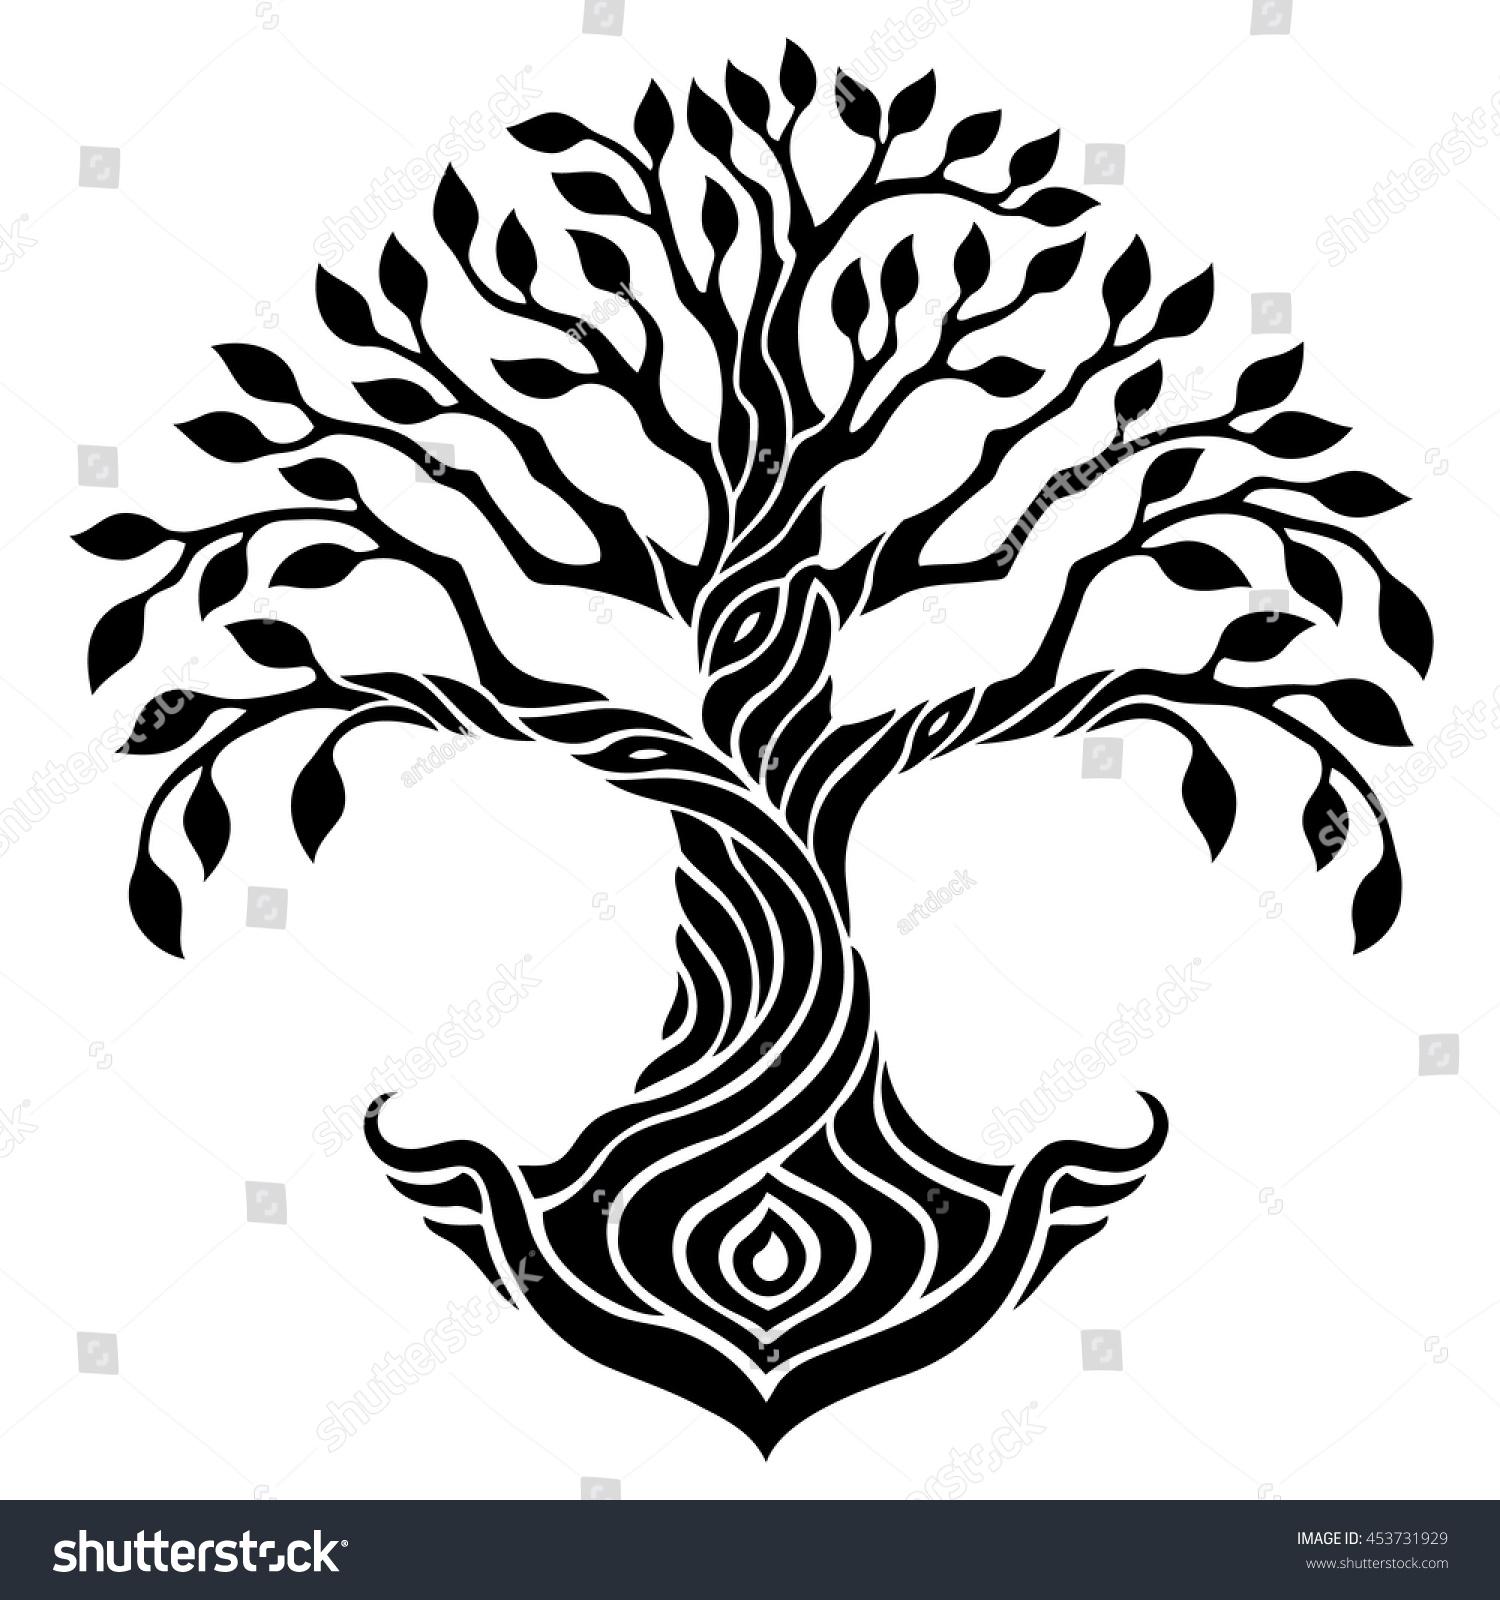 vector illustration decorative tree life seed stock vector royalty